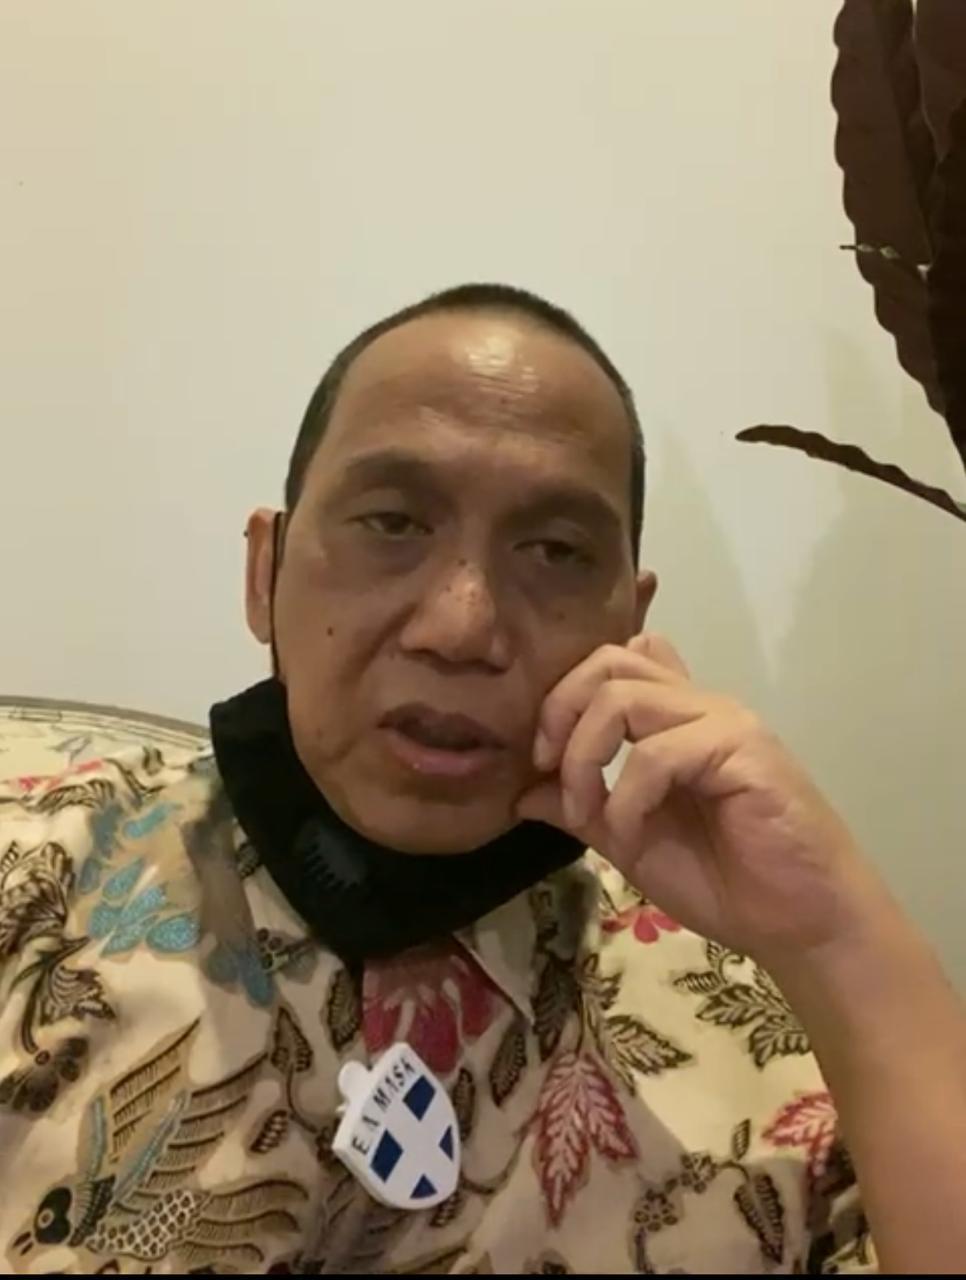 Pakar Hukum Sebut Tidak Ada Makna Polisi Unlawful Killing Terkait Kasus Laskar FPI